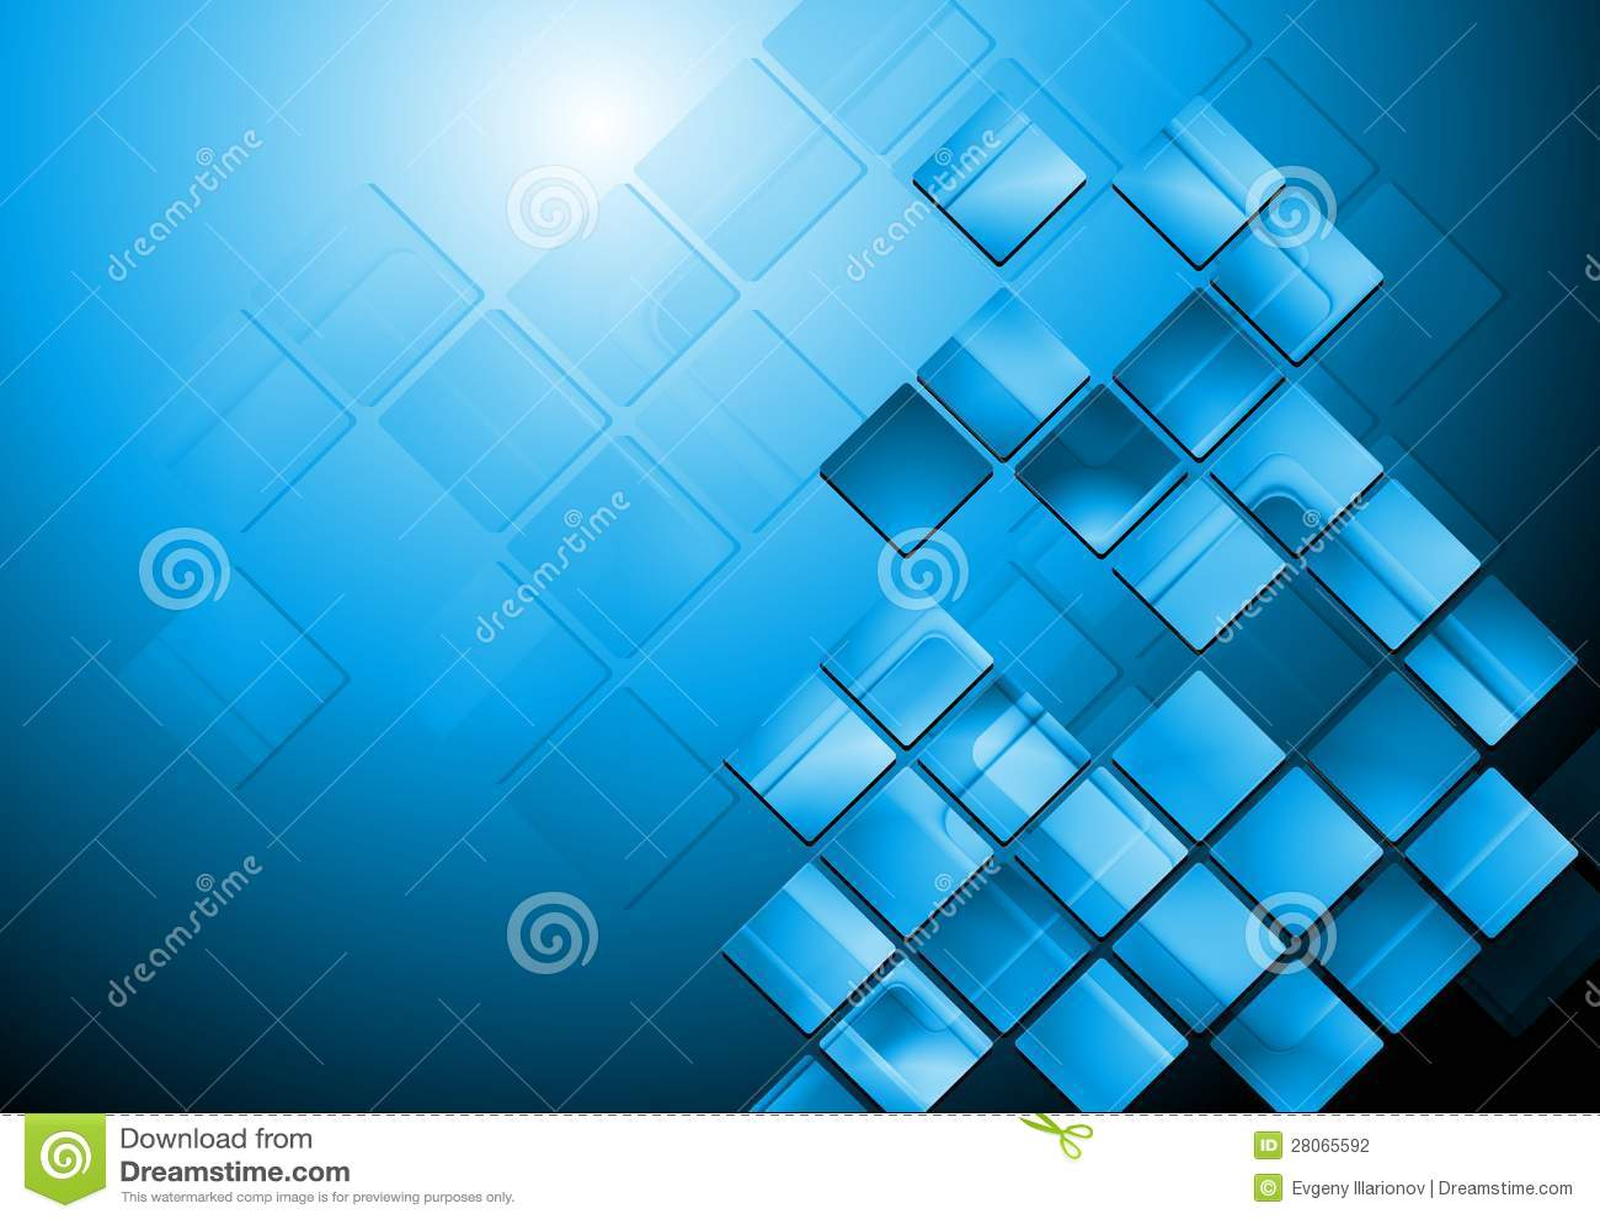 Blue Technology: Bright Blue Hi-tech Vector Design Stock Photography